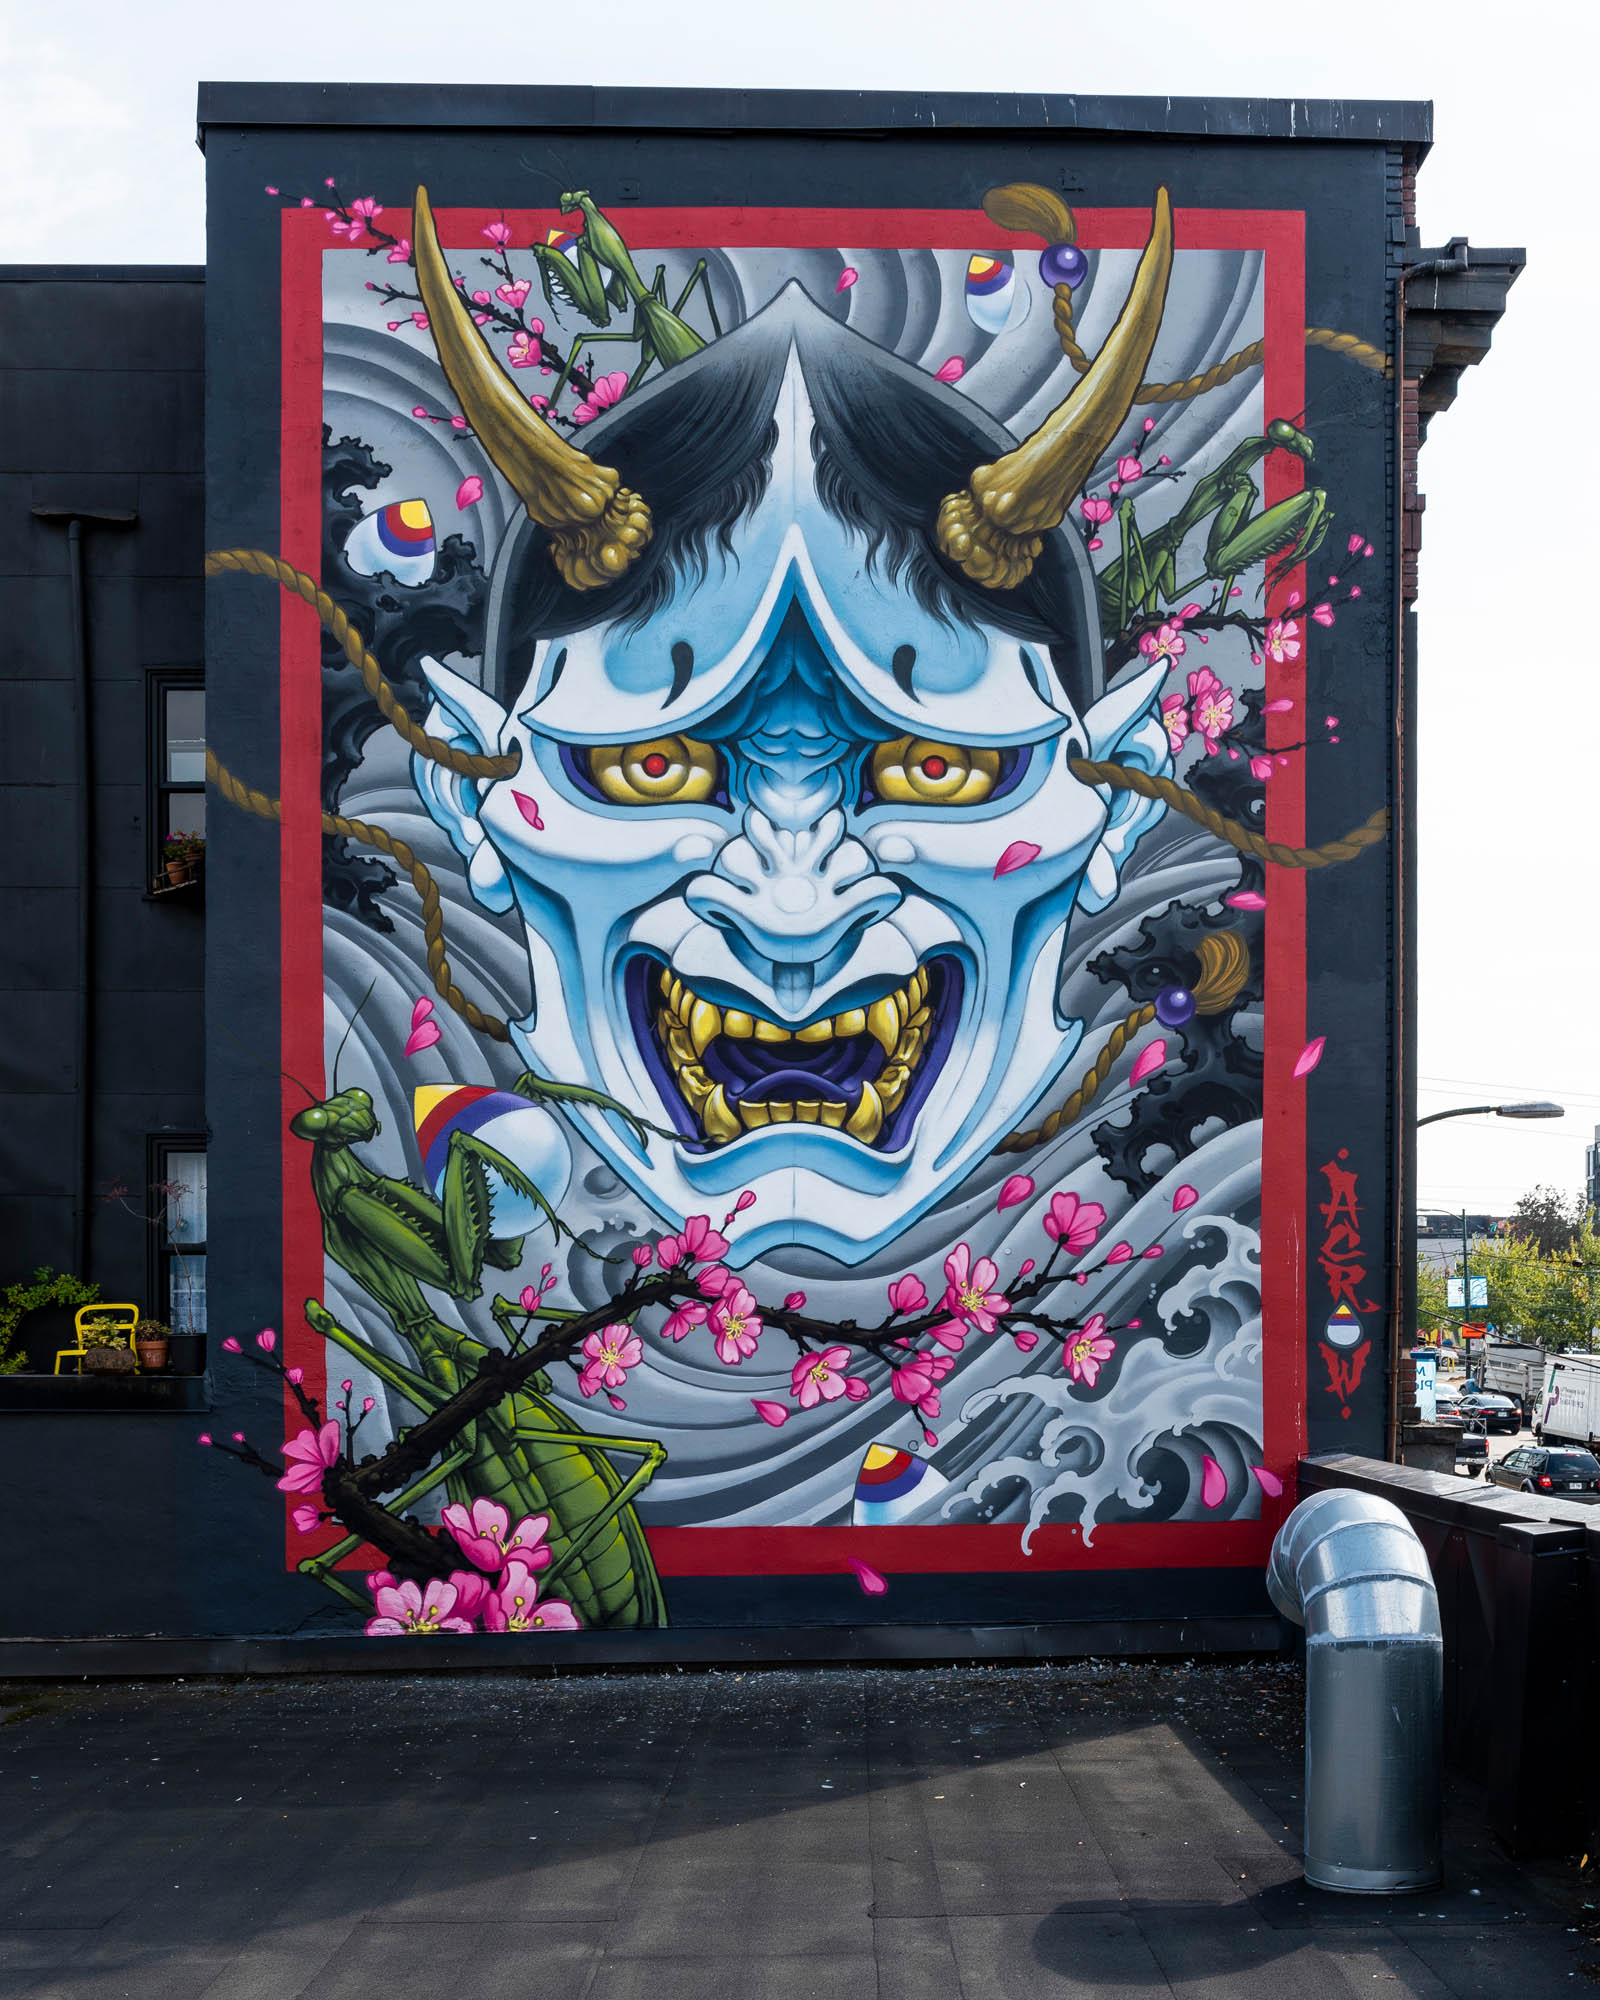 GabrielMartins_VMF_Murals2018_20180829_021.jpg